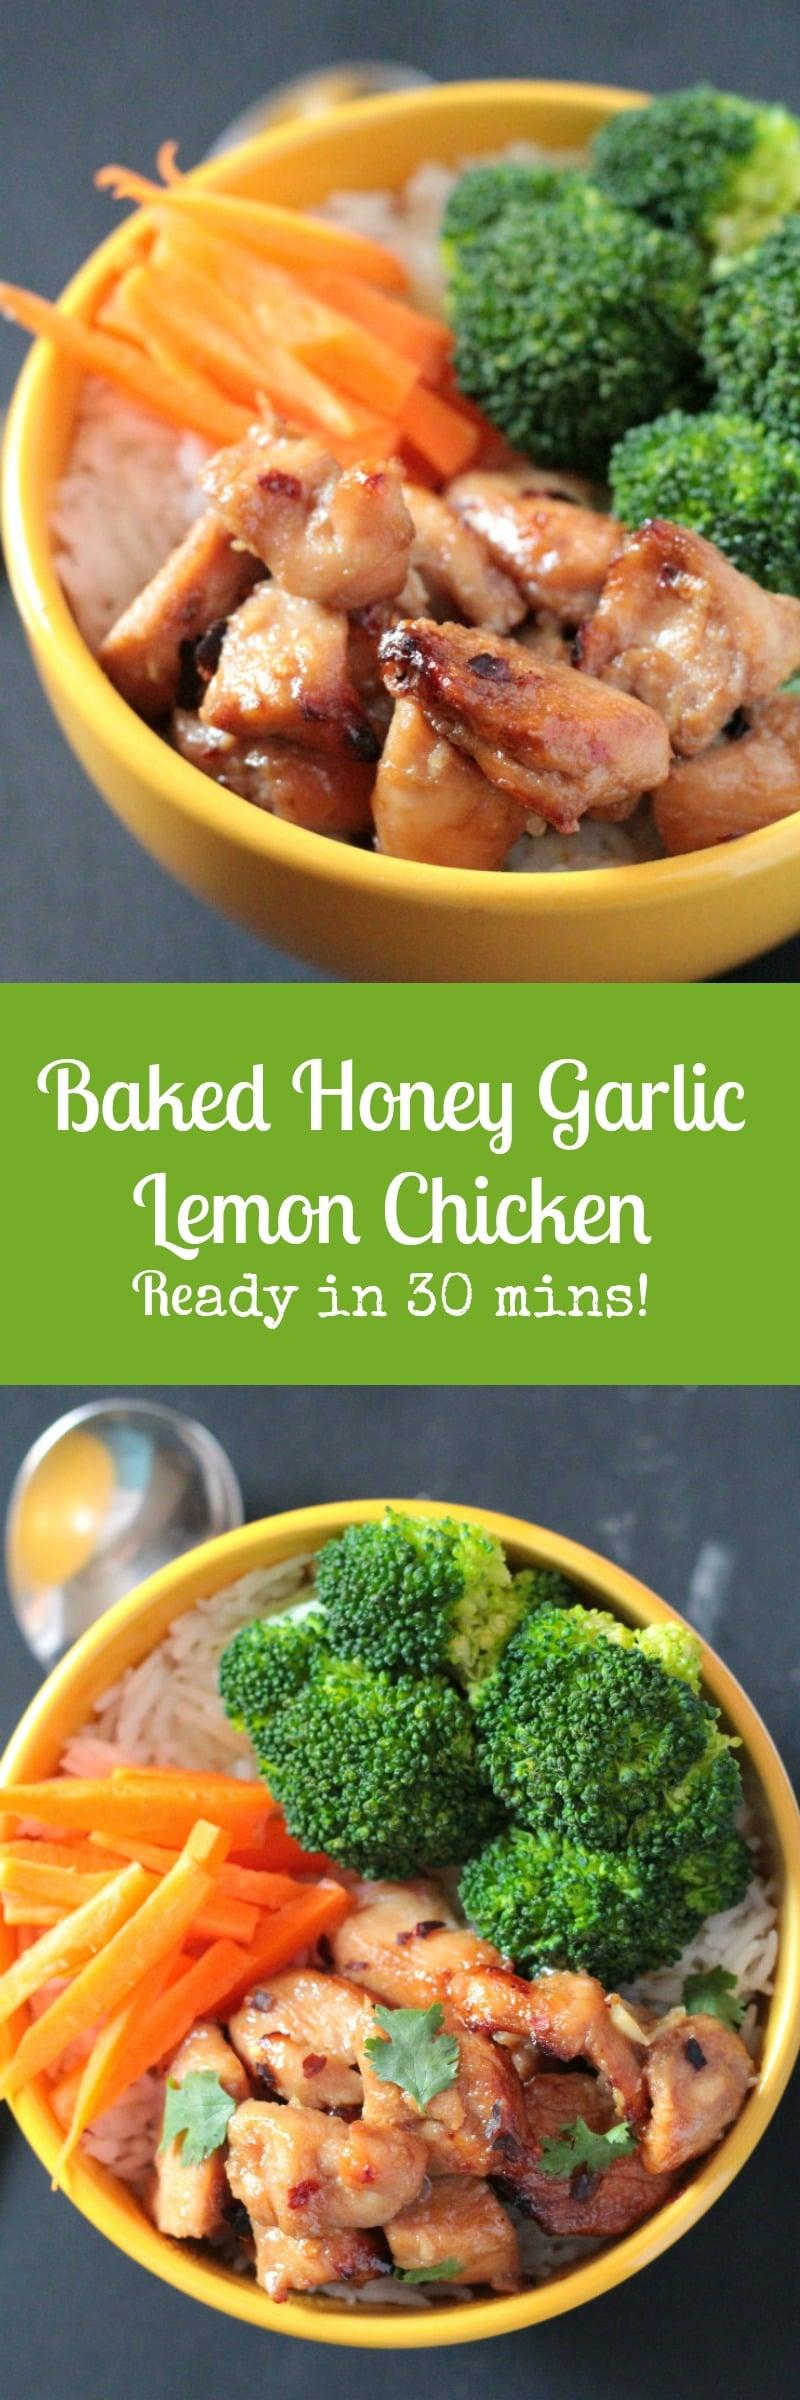 Baked Honey Garlic Lemon Chicken - 30 minute meal!